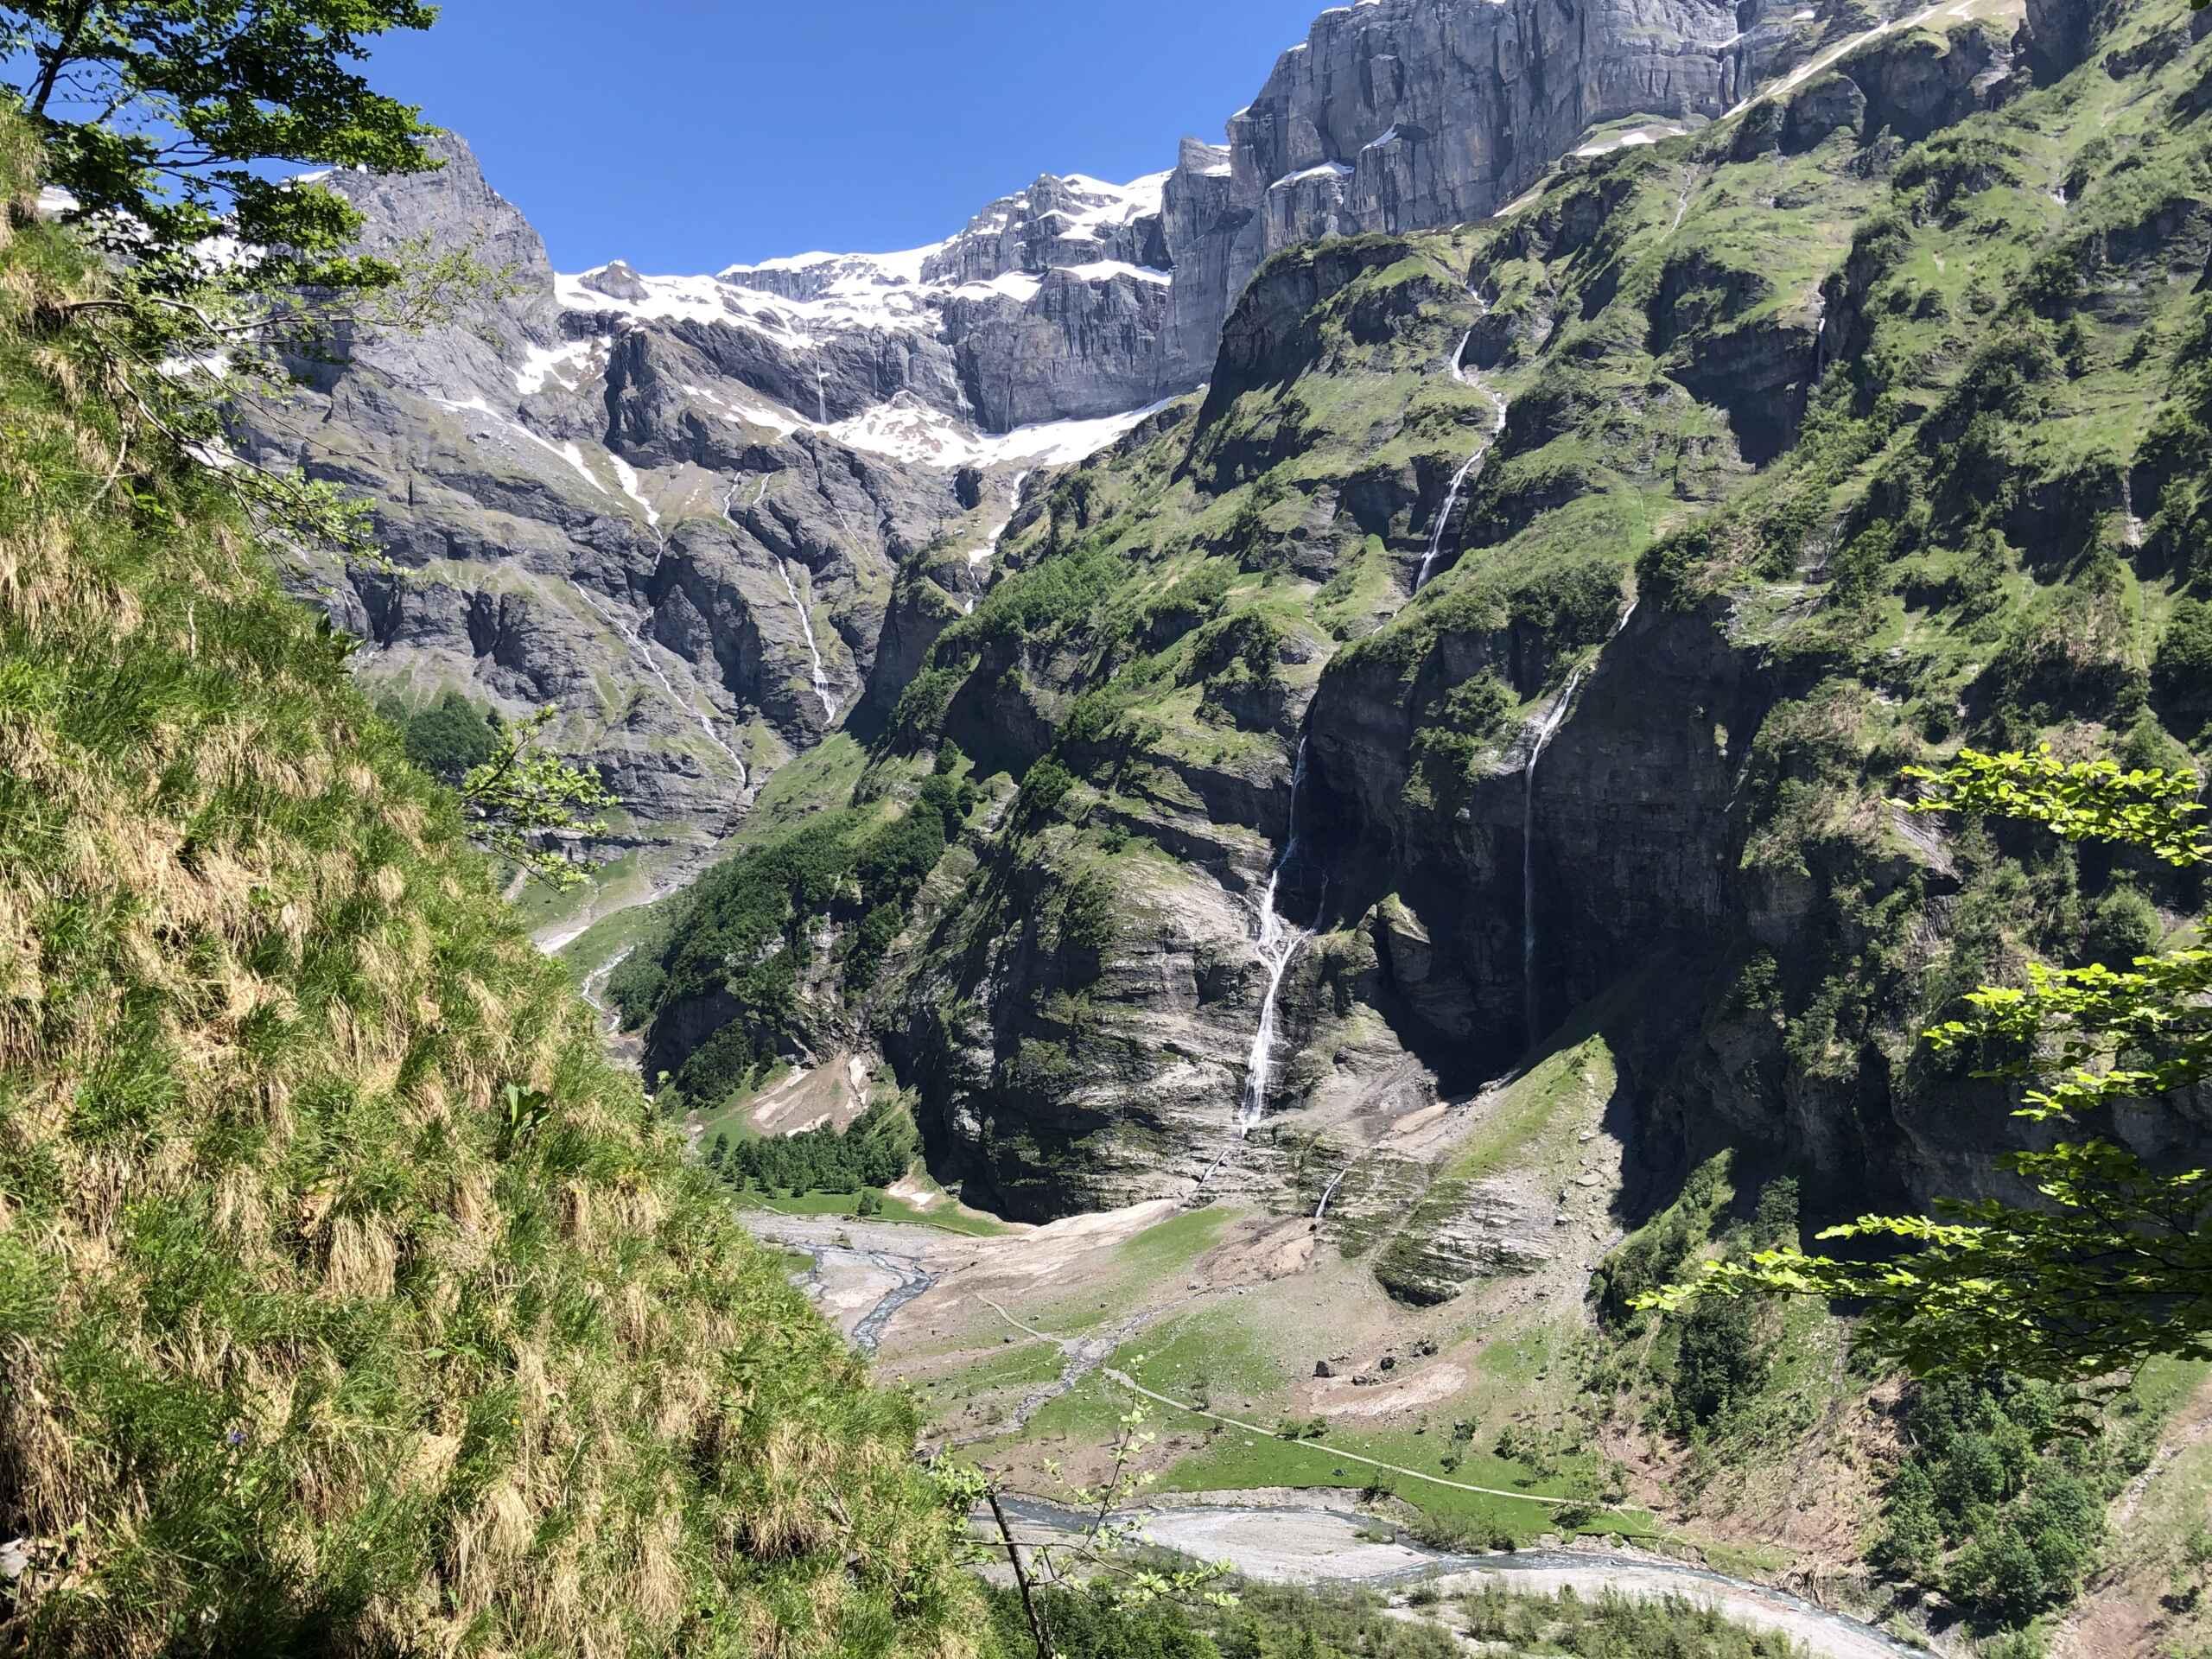 Petites balades en Rhône-Alpes - Page 3 Sixt_f17